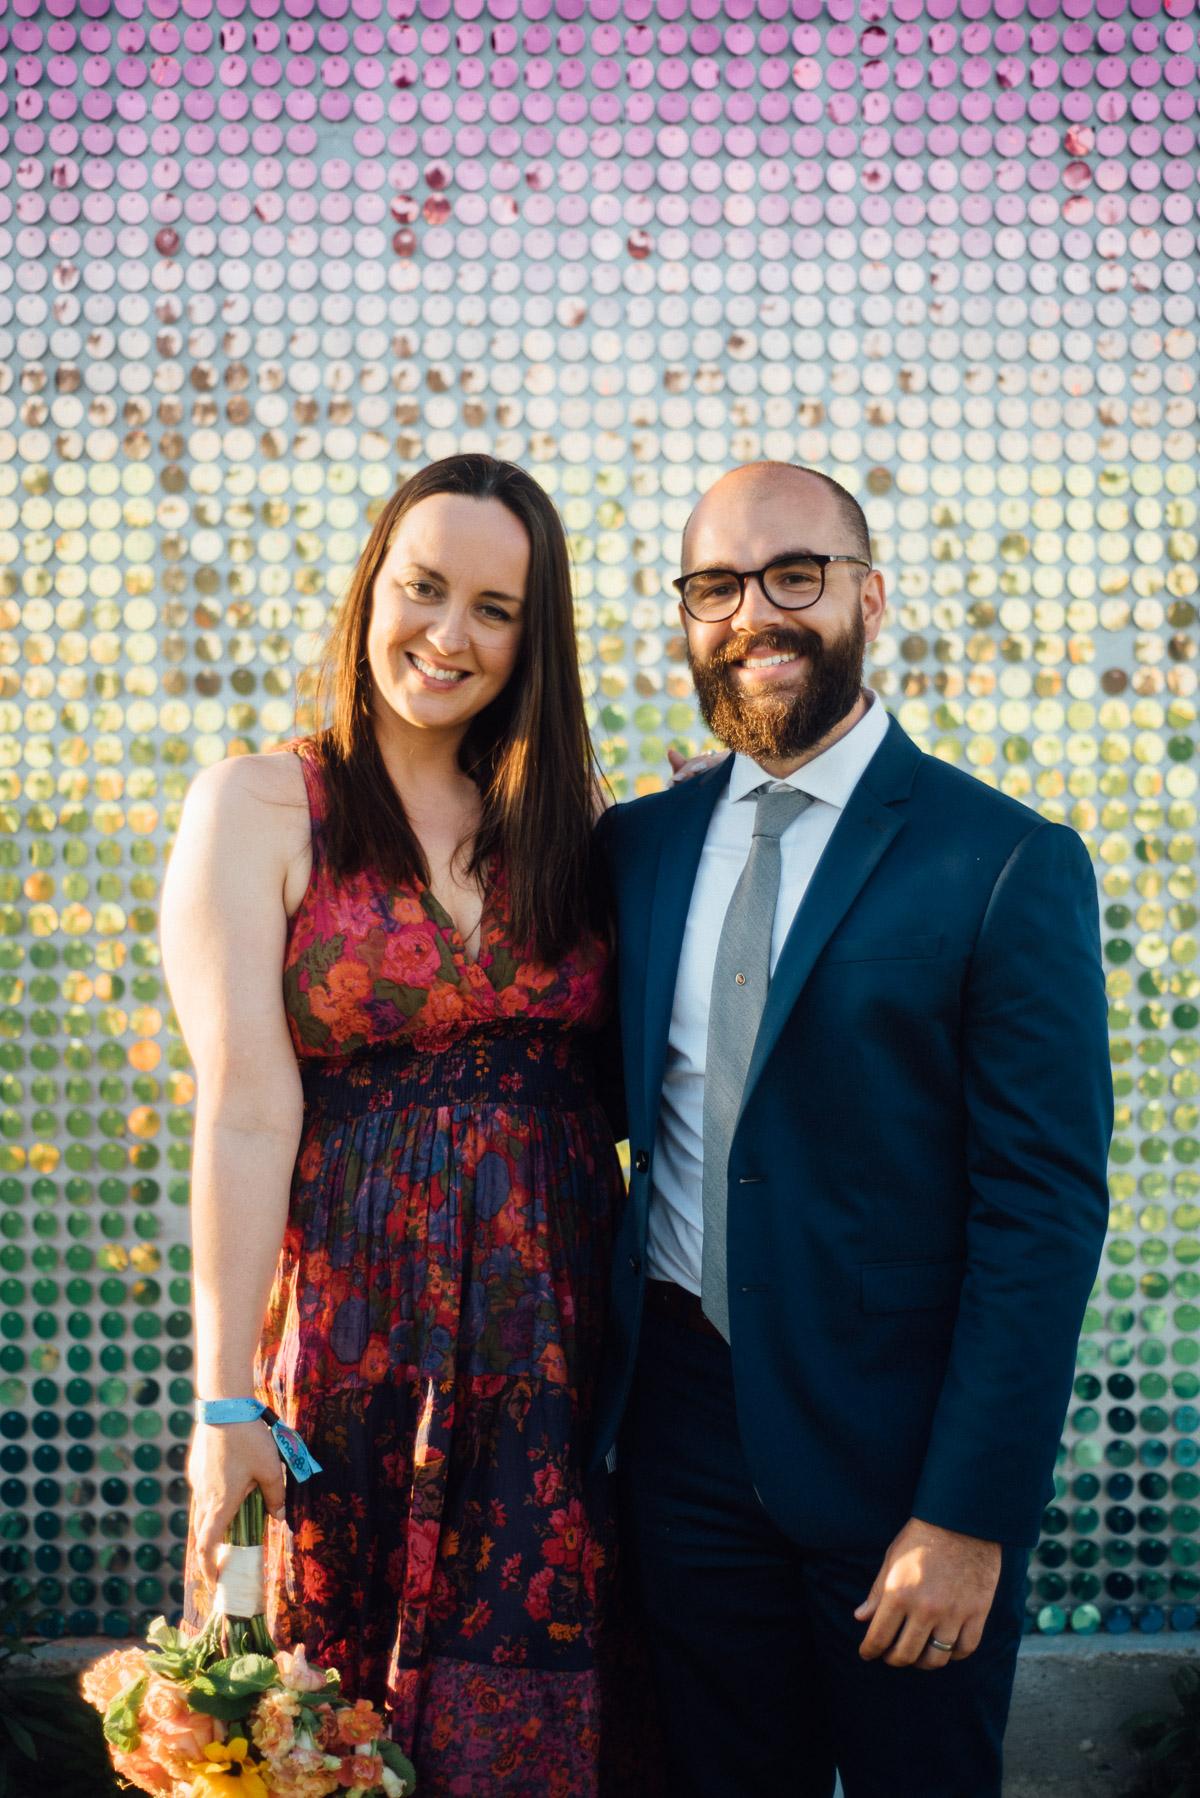 bonnaroo-couple-wedding Bonnaroo Music Festival Wedding | James and Jen